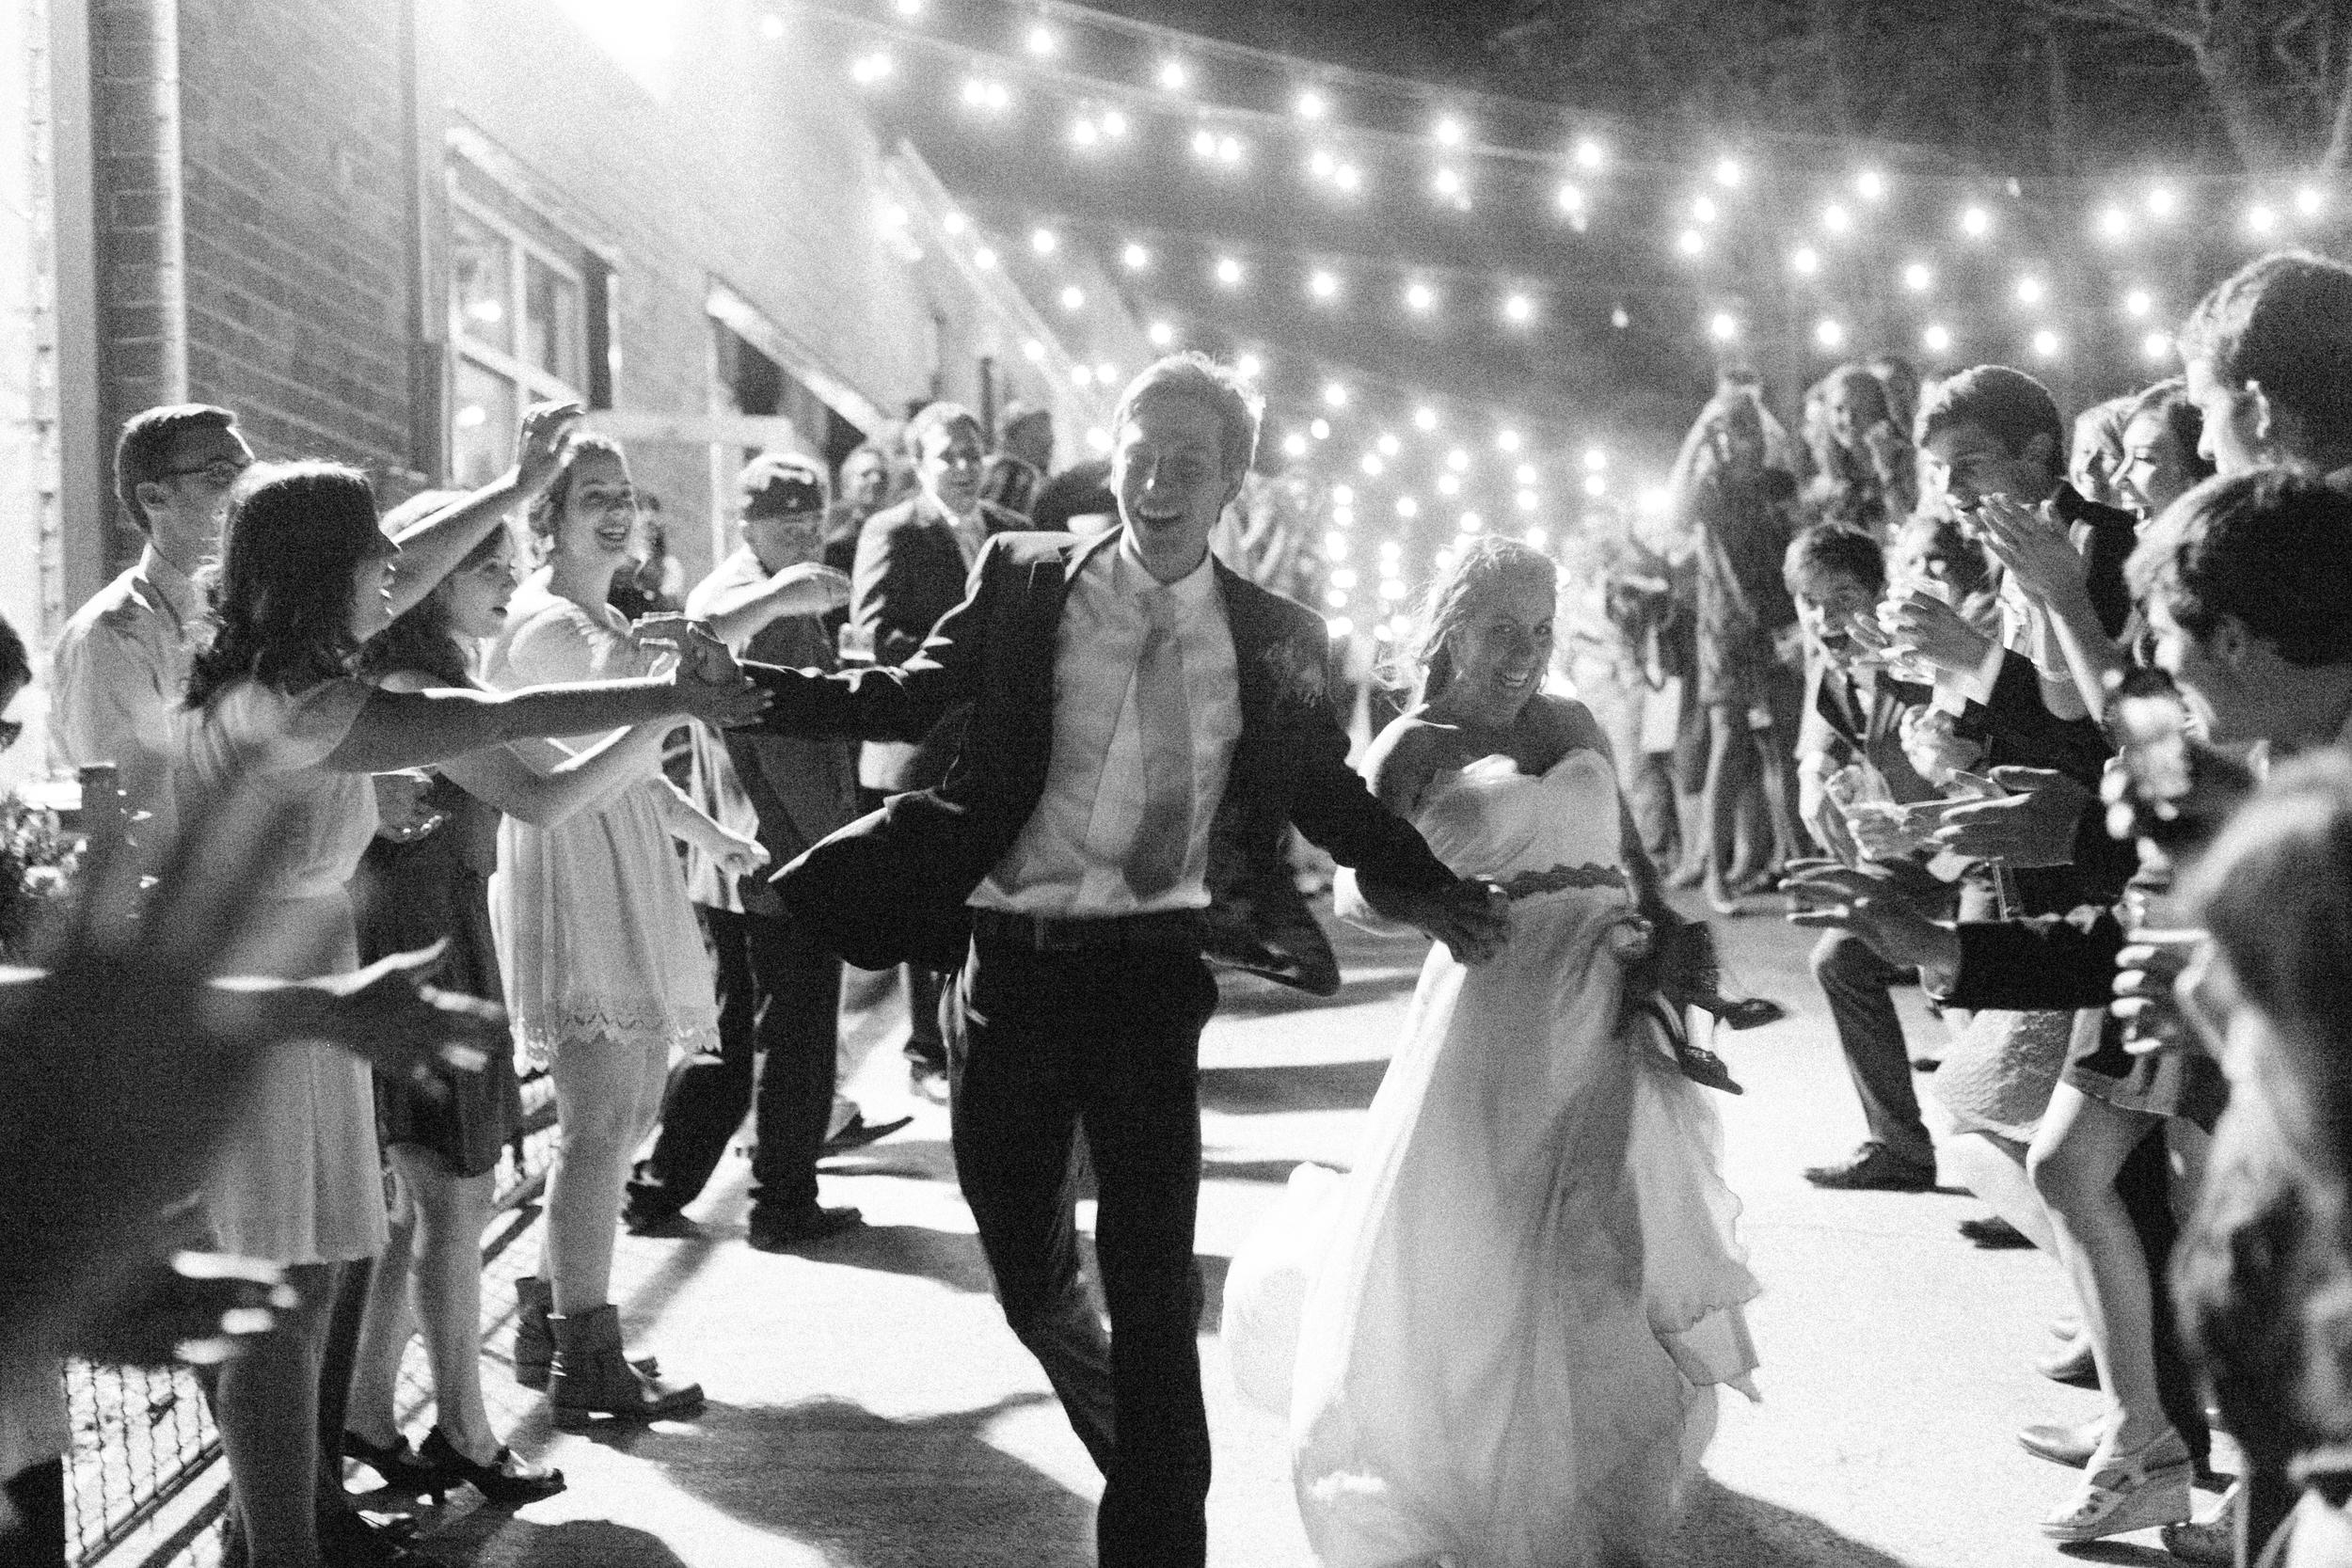 Kathryn-McCrary-Photography-Atlanta-Wedding-Photographer-86.jpg